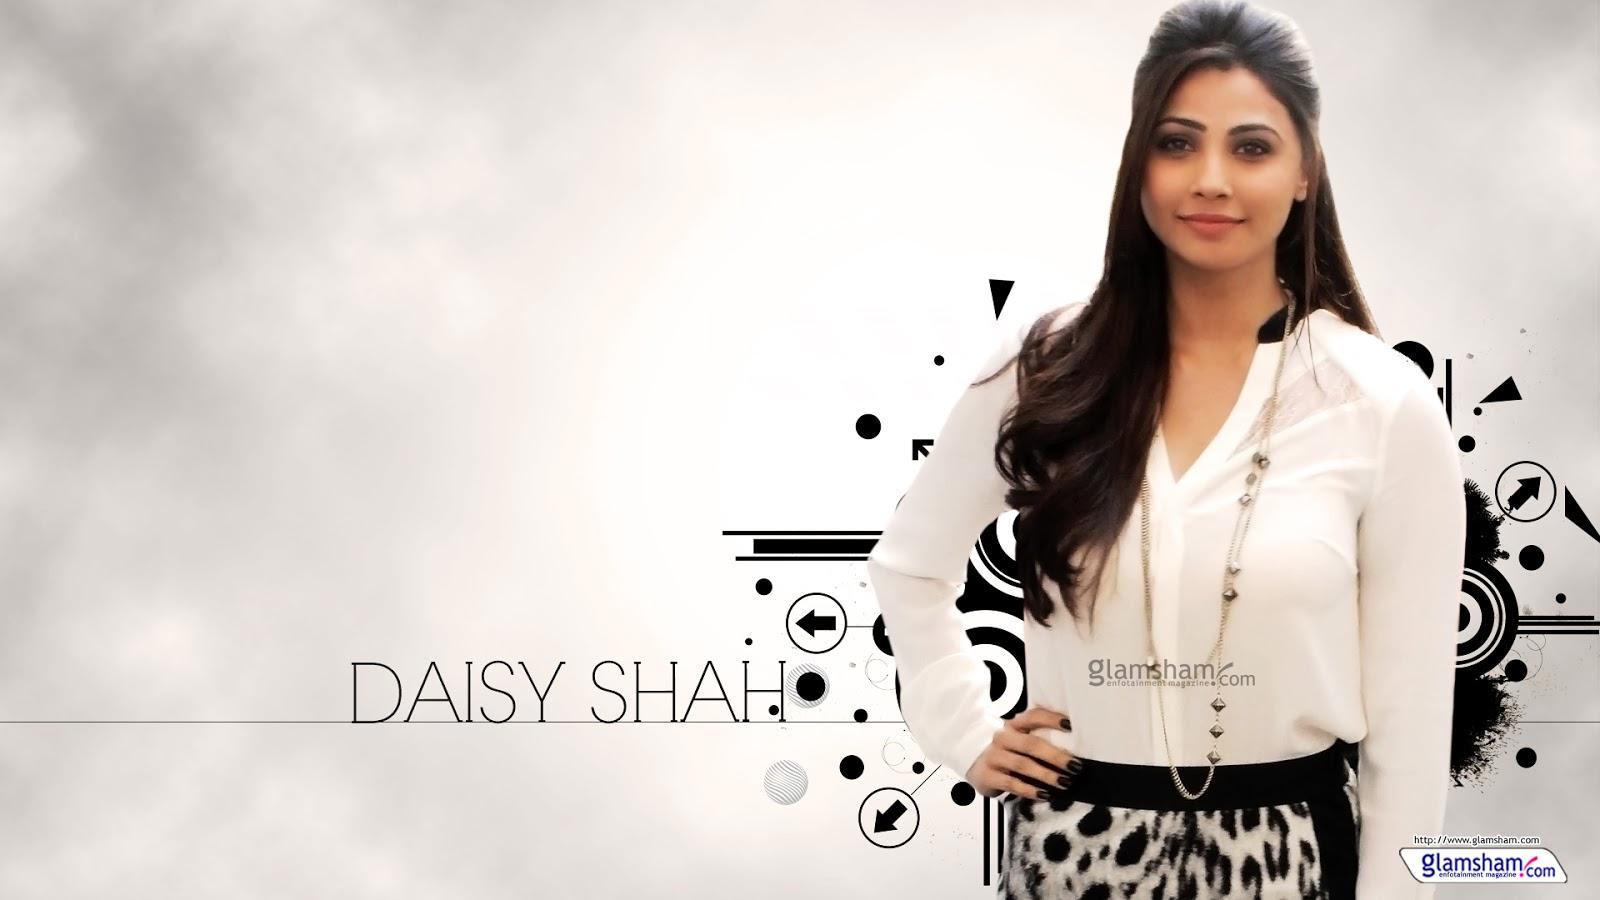 Daisy Shah Hd Wallpapers - Wallpapersh-6334